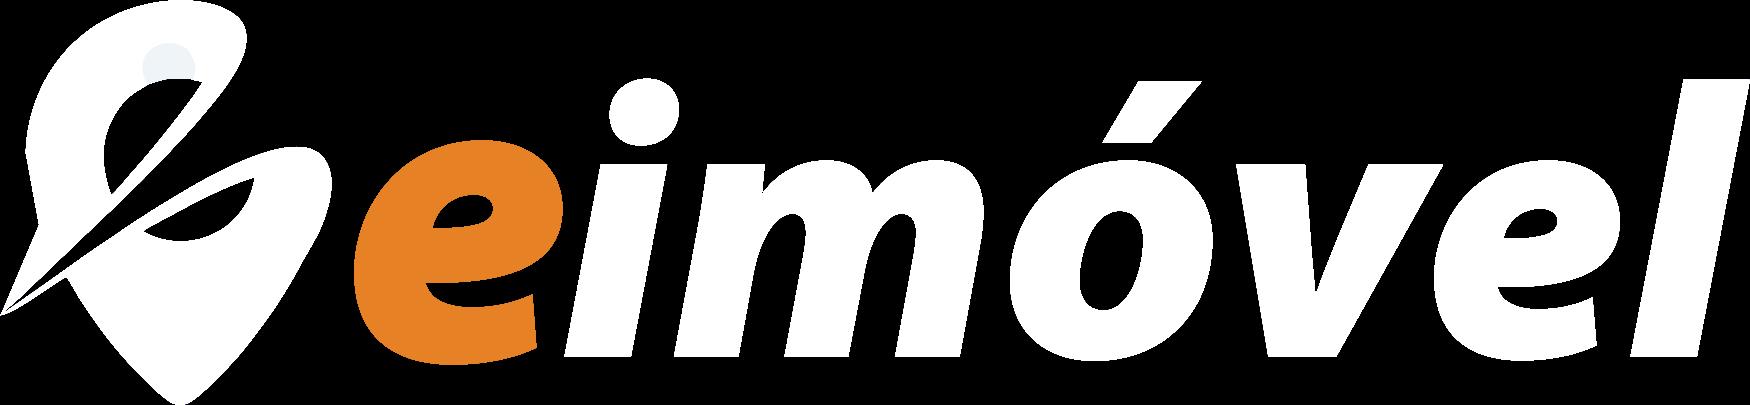 EIMOVEL - Realizando sonhos